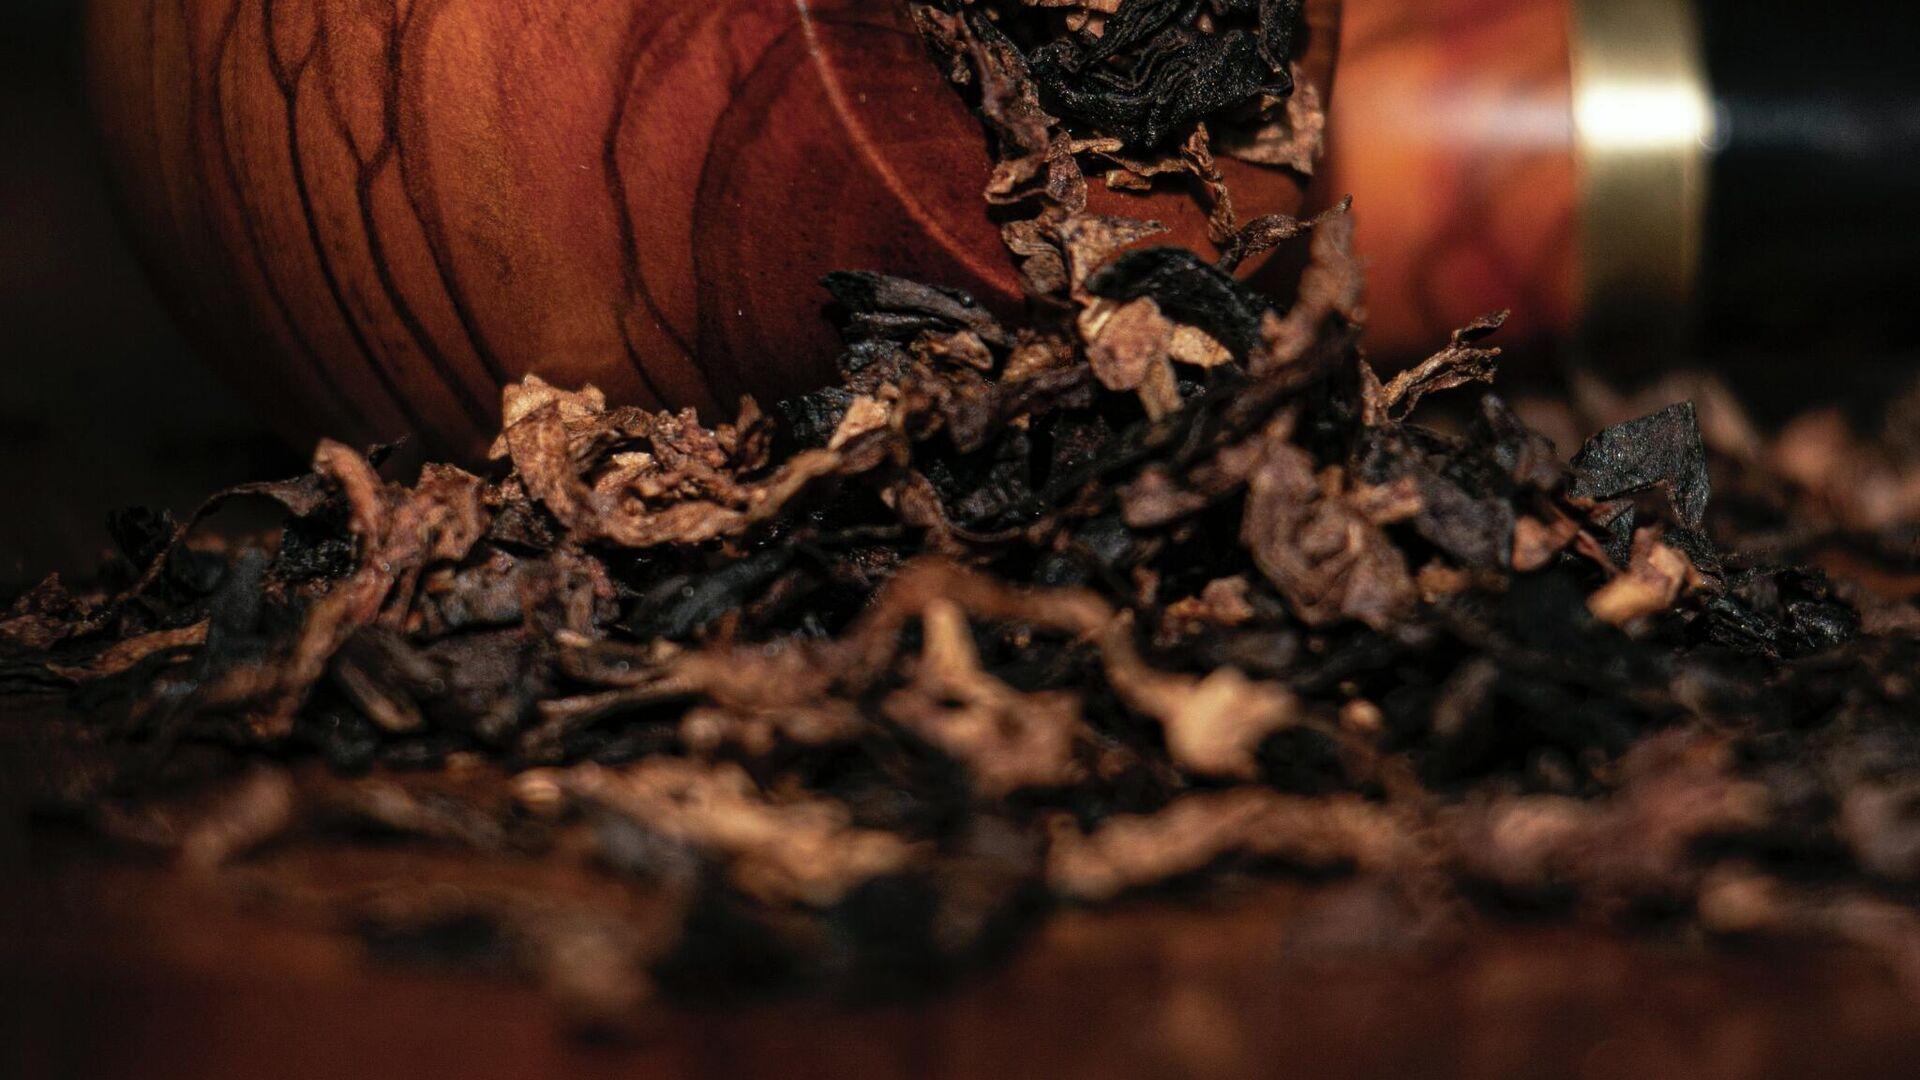 Tabaco en una pipa - Sputnik Mundo, 1920, 11.10.2021